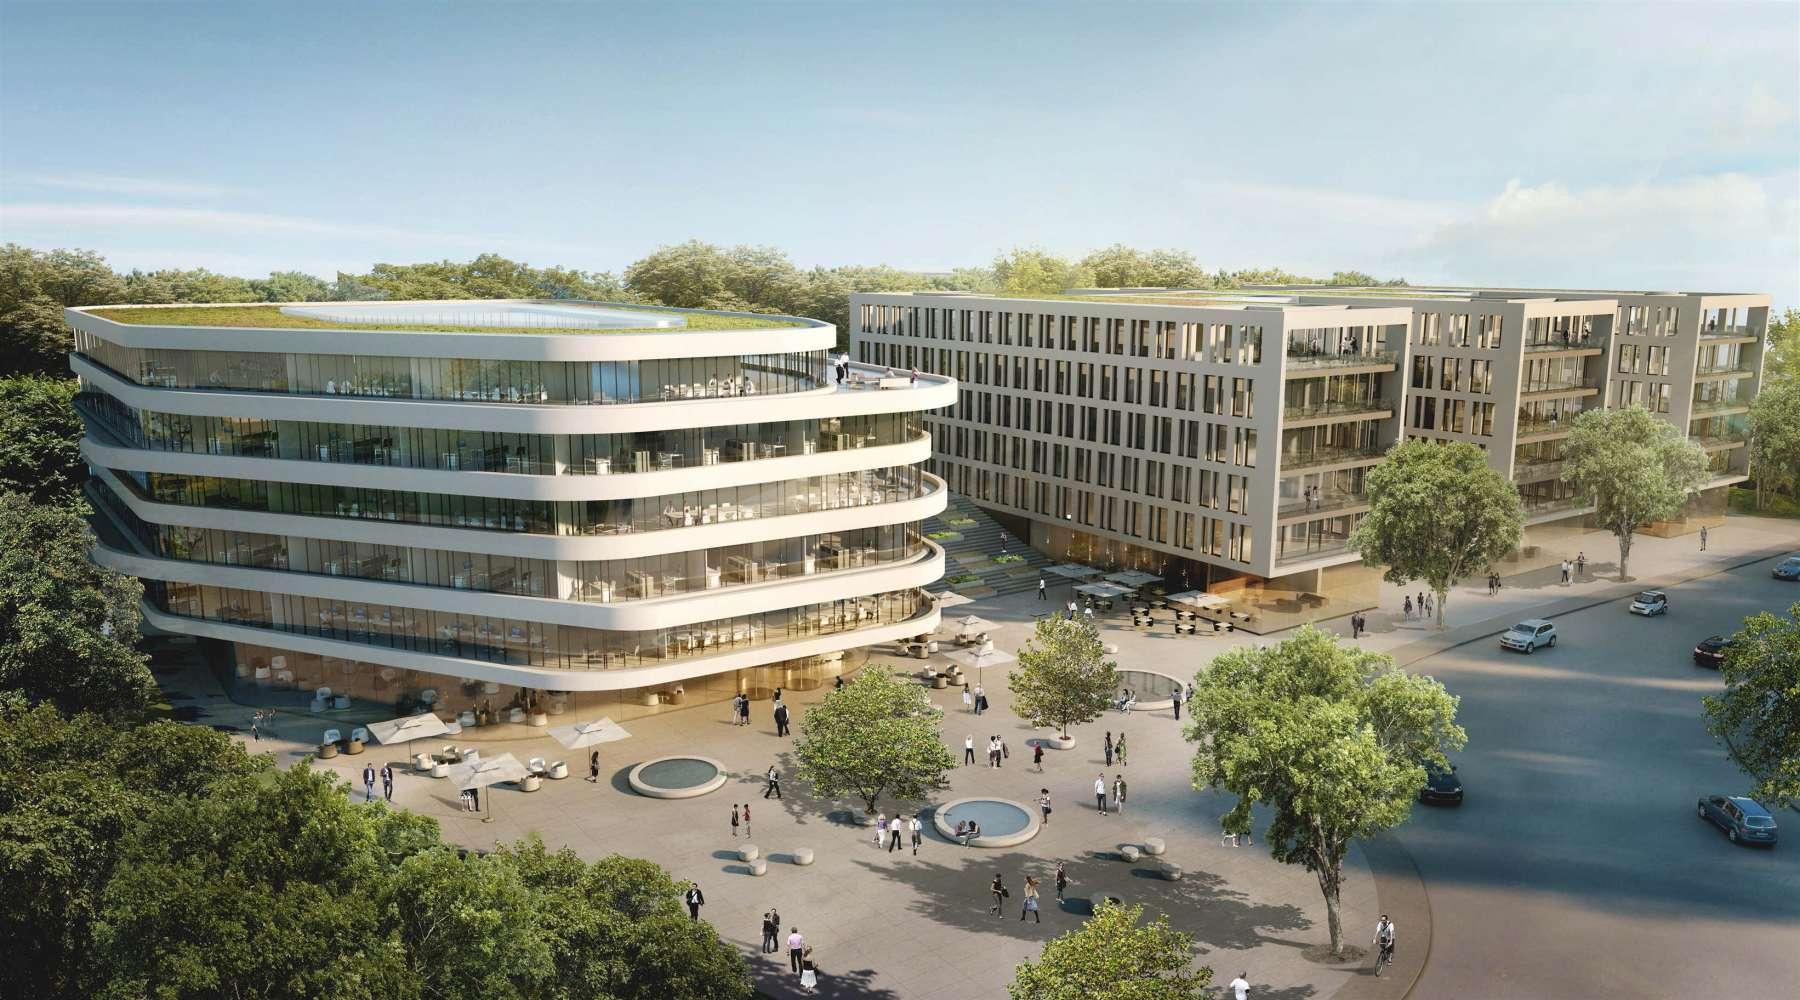 Büros Bad homburg, 61352 - Büro - Bad Homburg - F2314 - 9501634